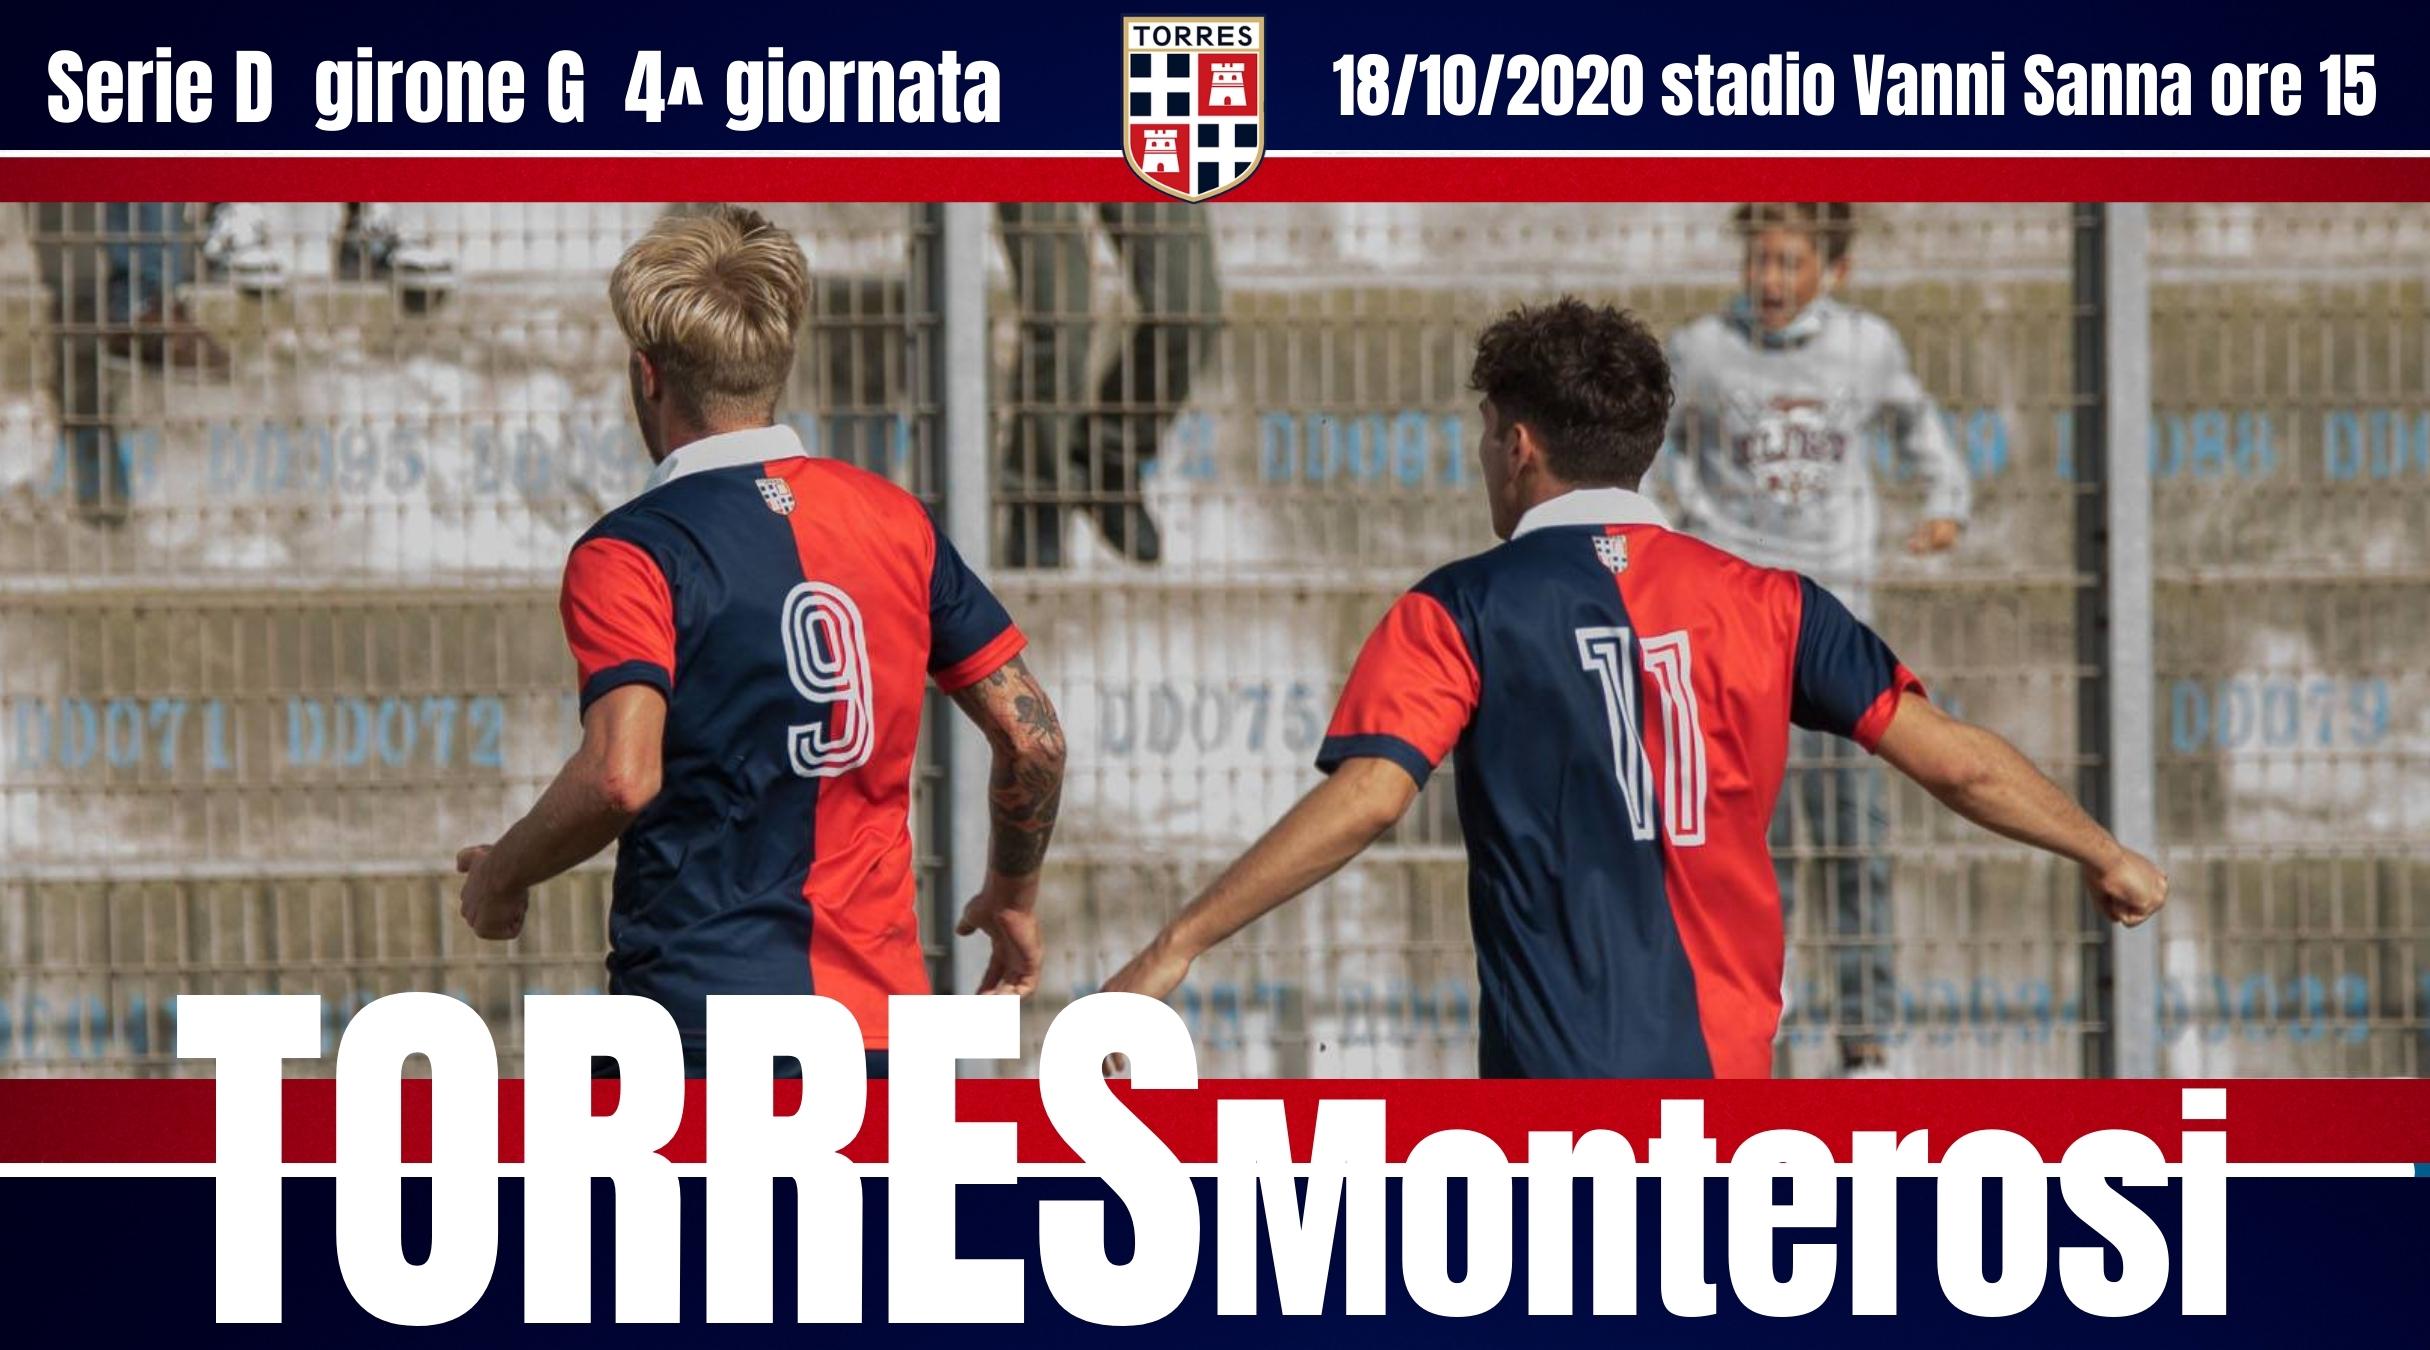 TORRES | Info biglietteria Torres vs Monterosi